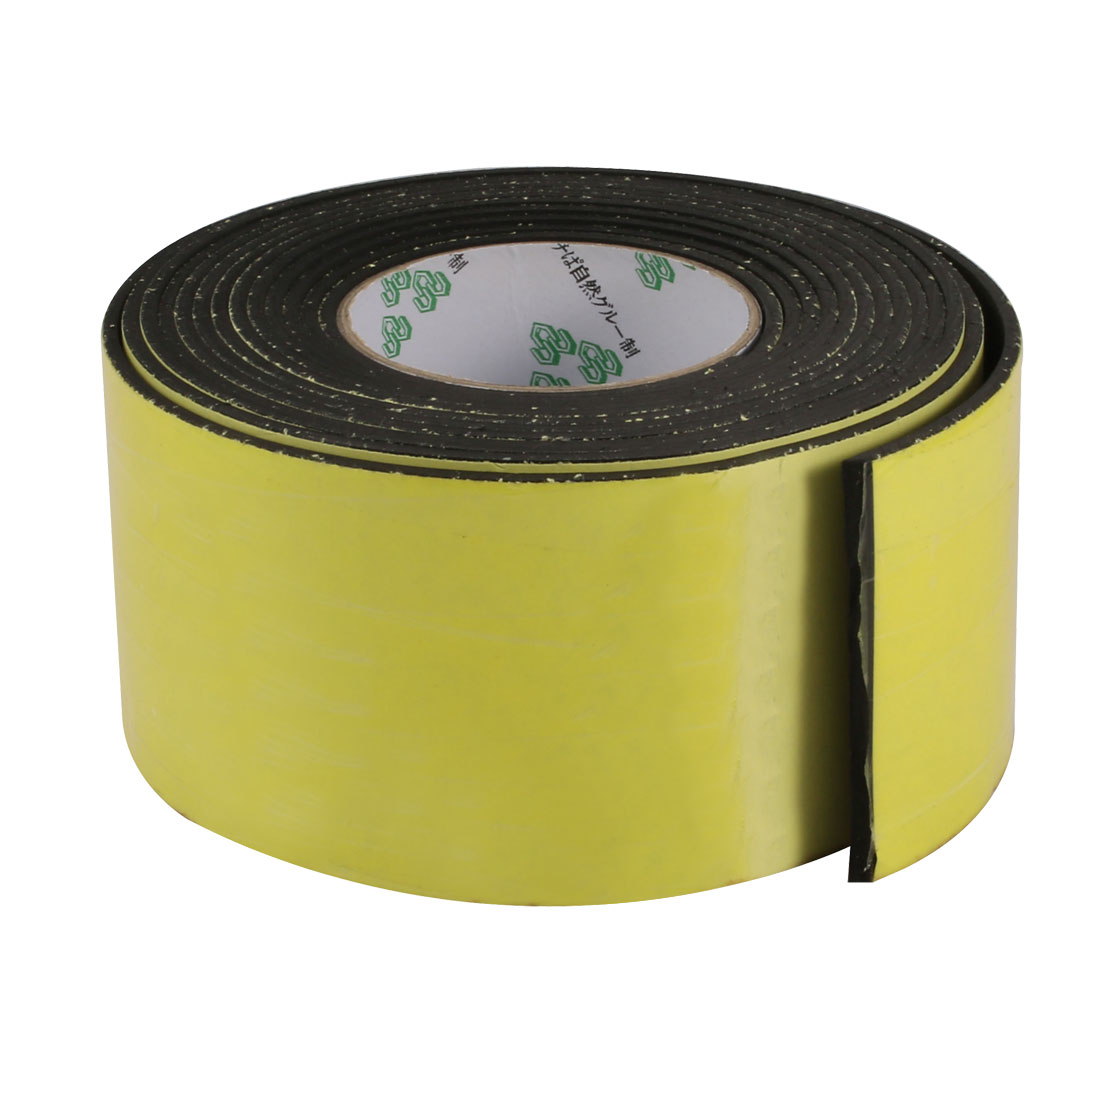 80mm Wide 3mm Thick Single Sided Shockproof EVA Sponge Tape Black 4 Meters Long